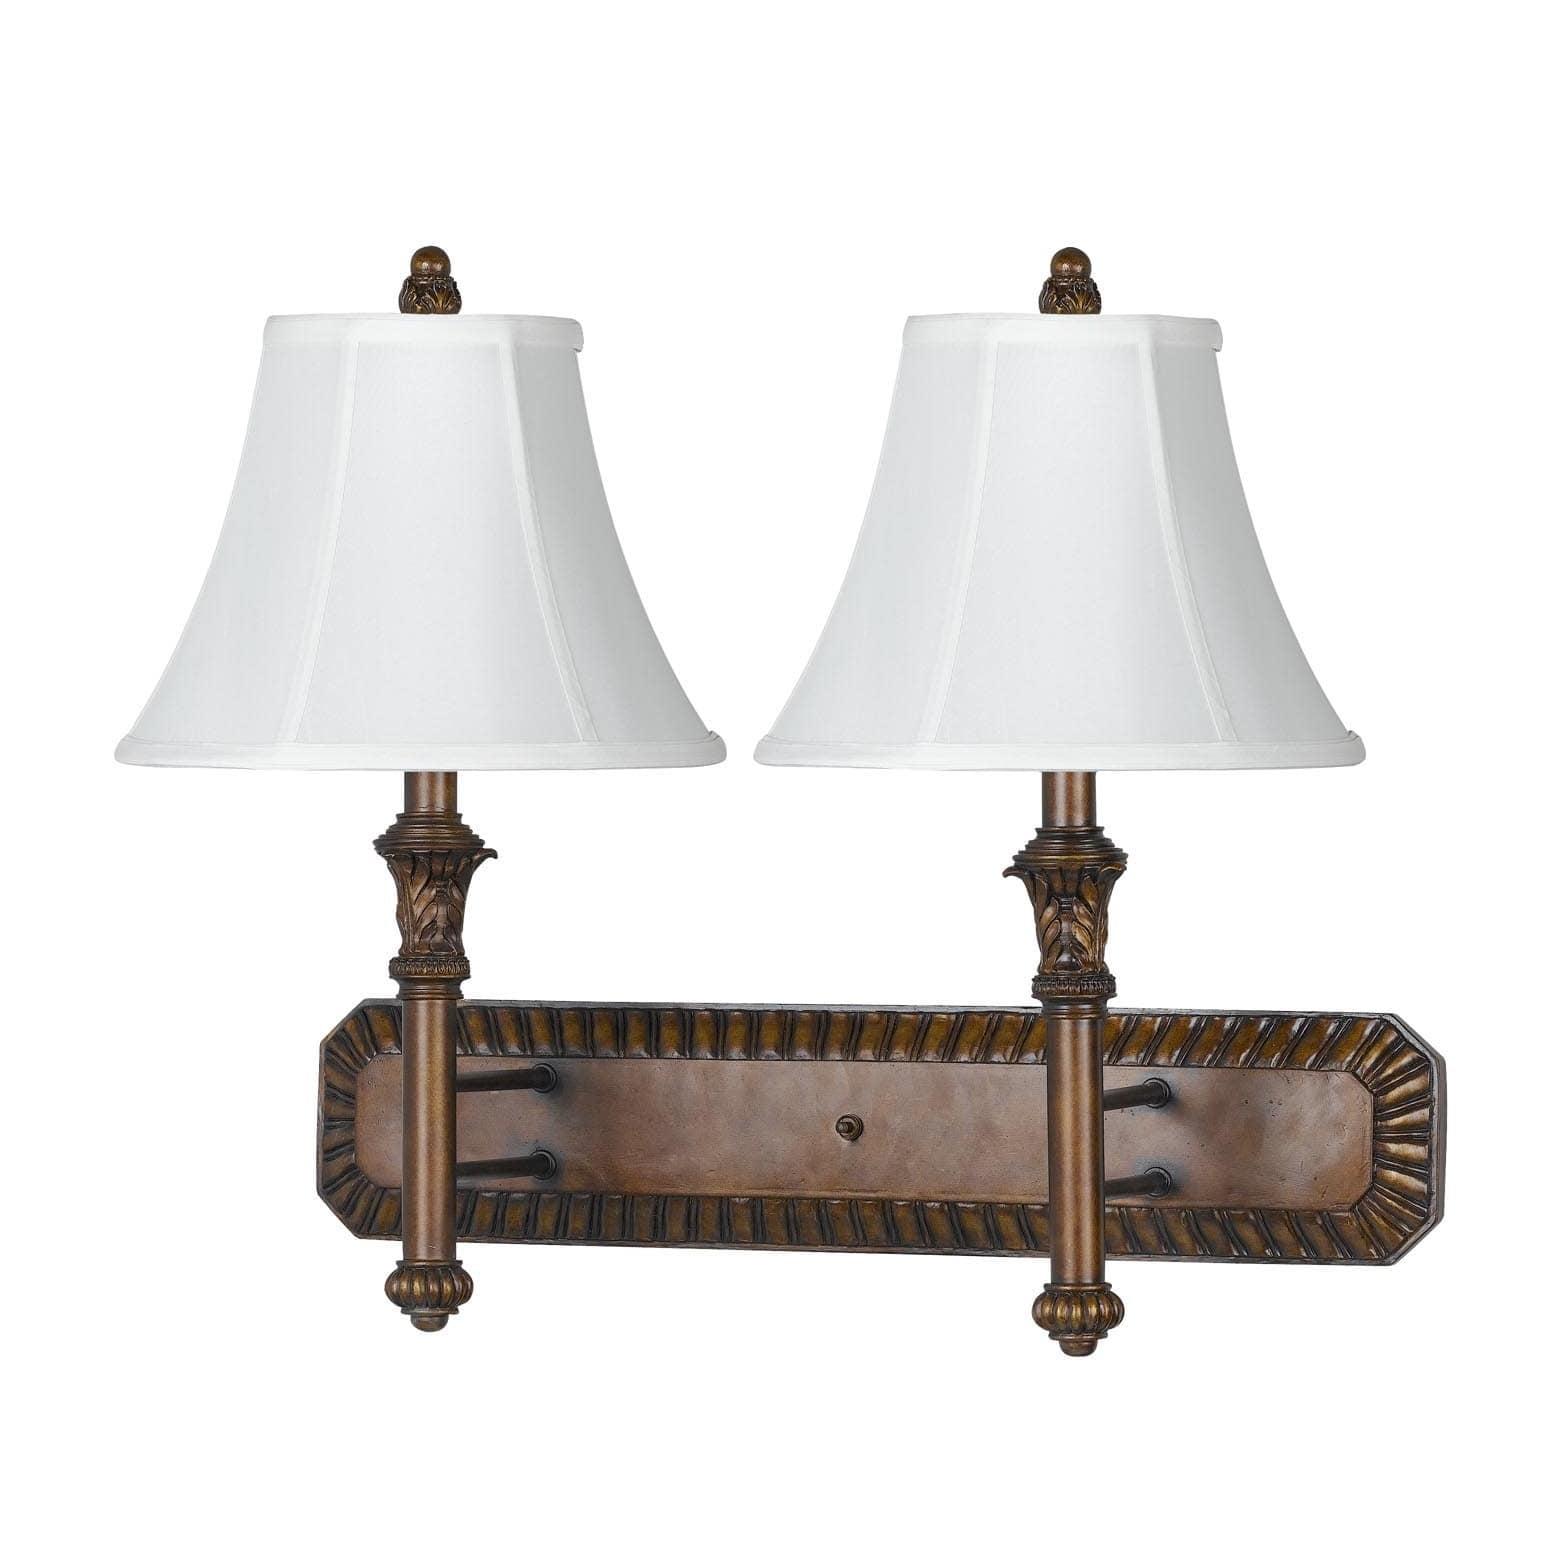 Cal Lighting 60-watt 2-light Wall Lamp by Overstock